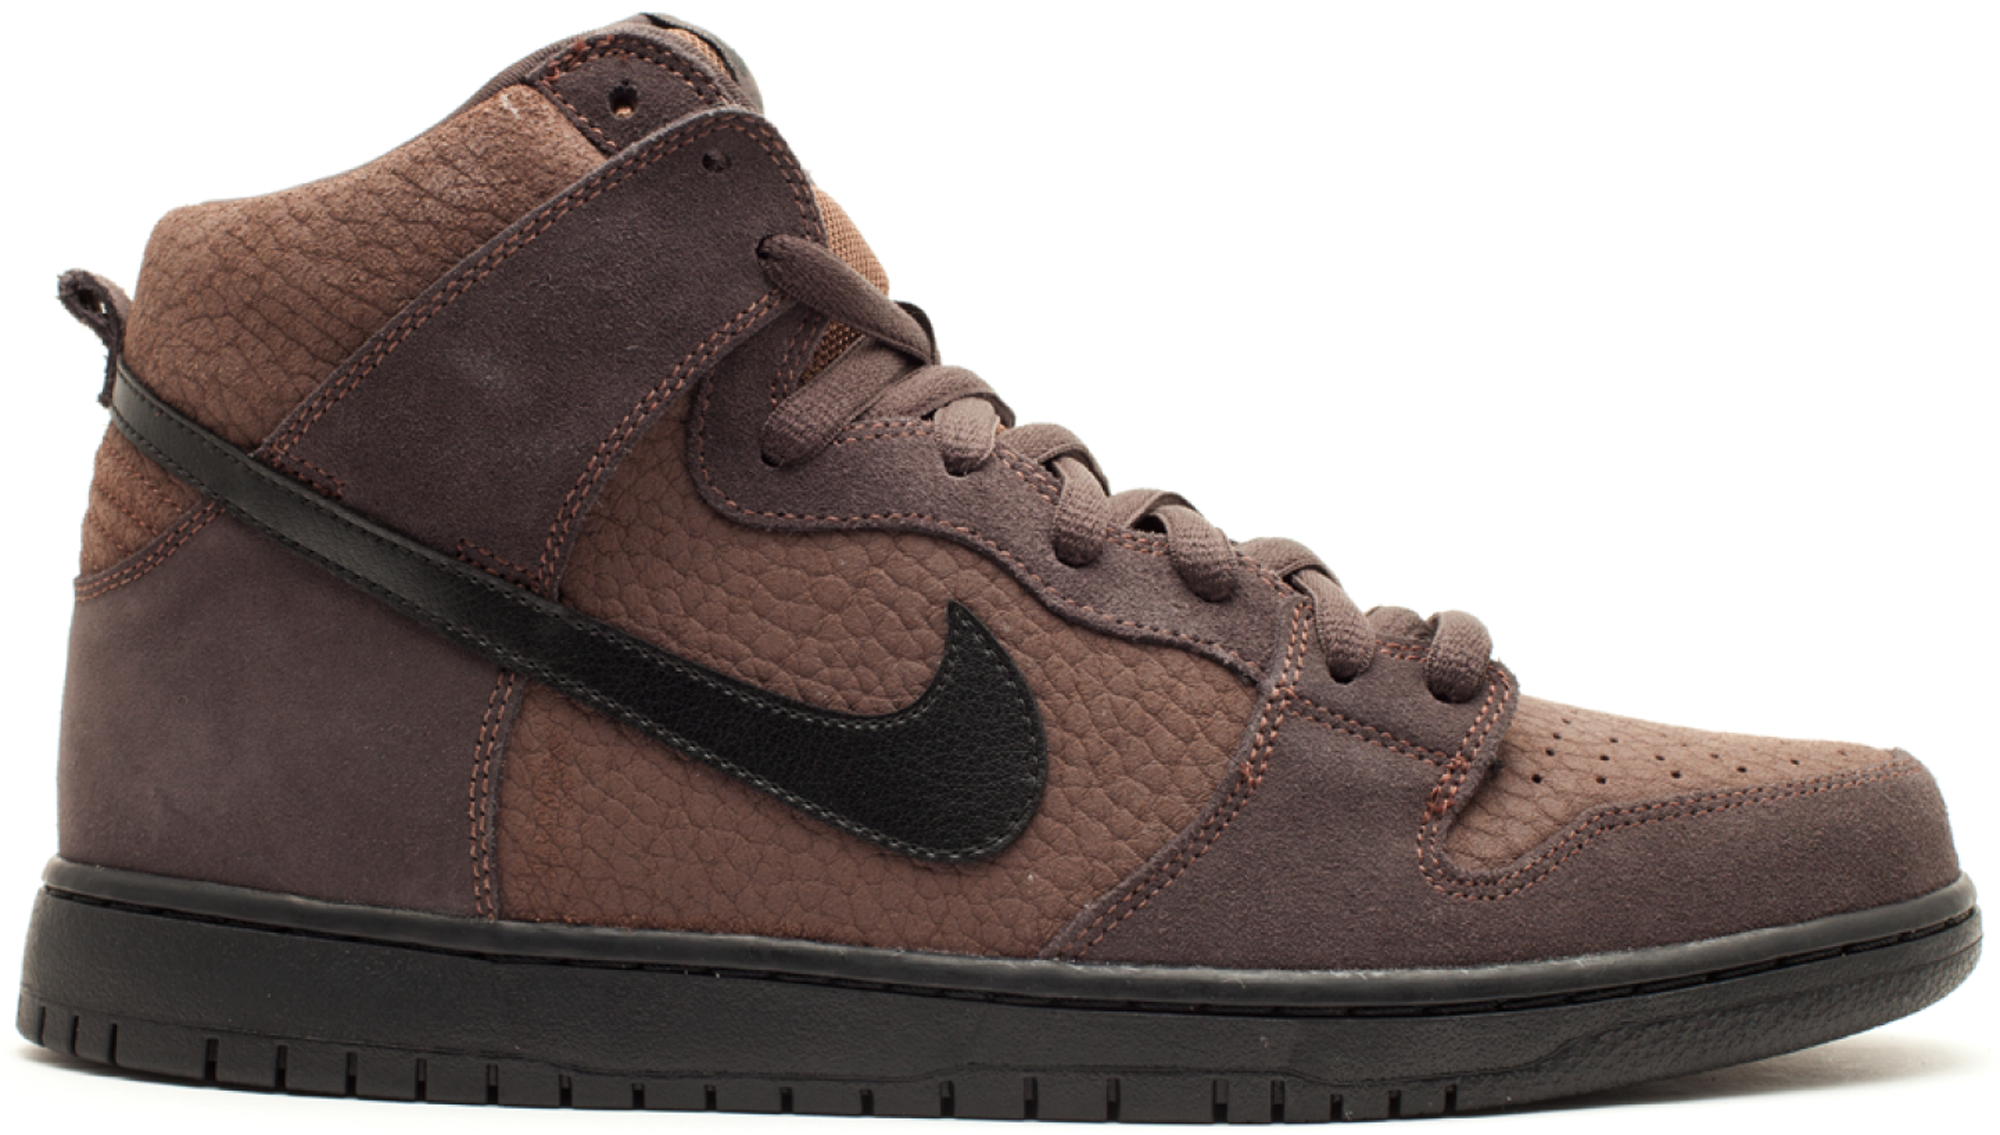 Nike SB Dunk High Dark Oak Black Tar